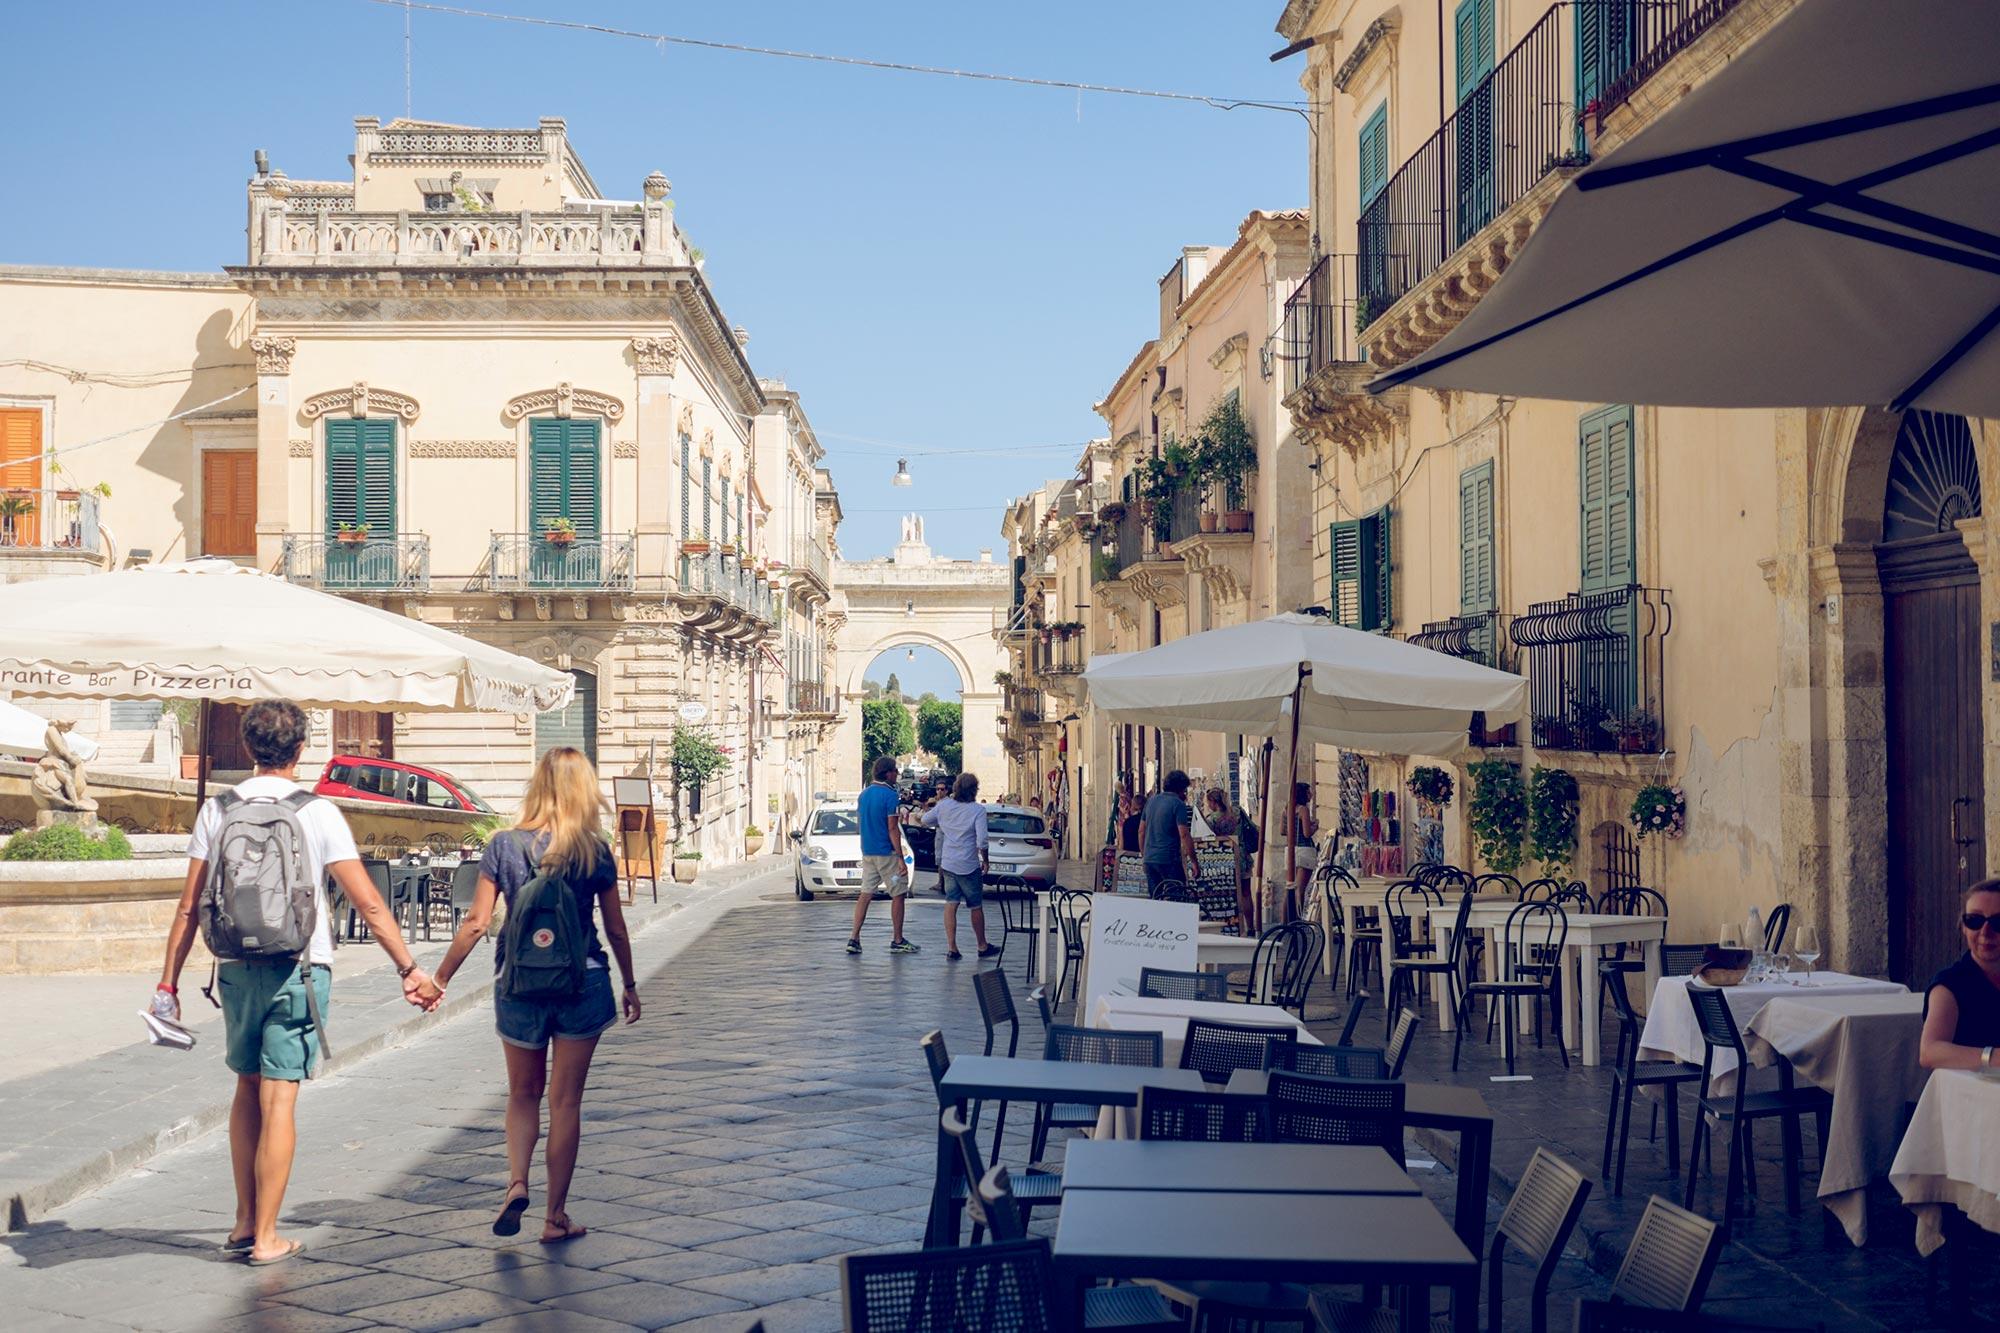 italy-sicilia-noto-chiesa-santa-chiara3